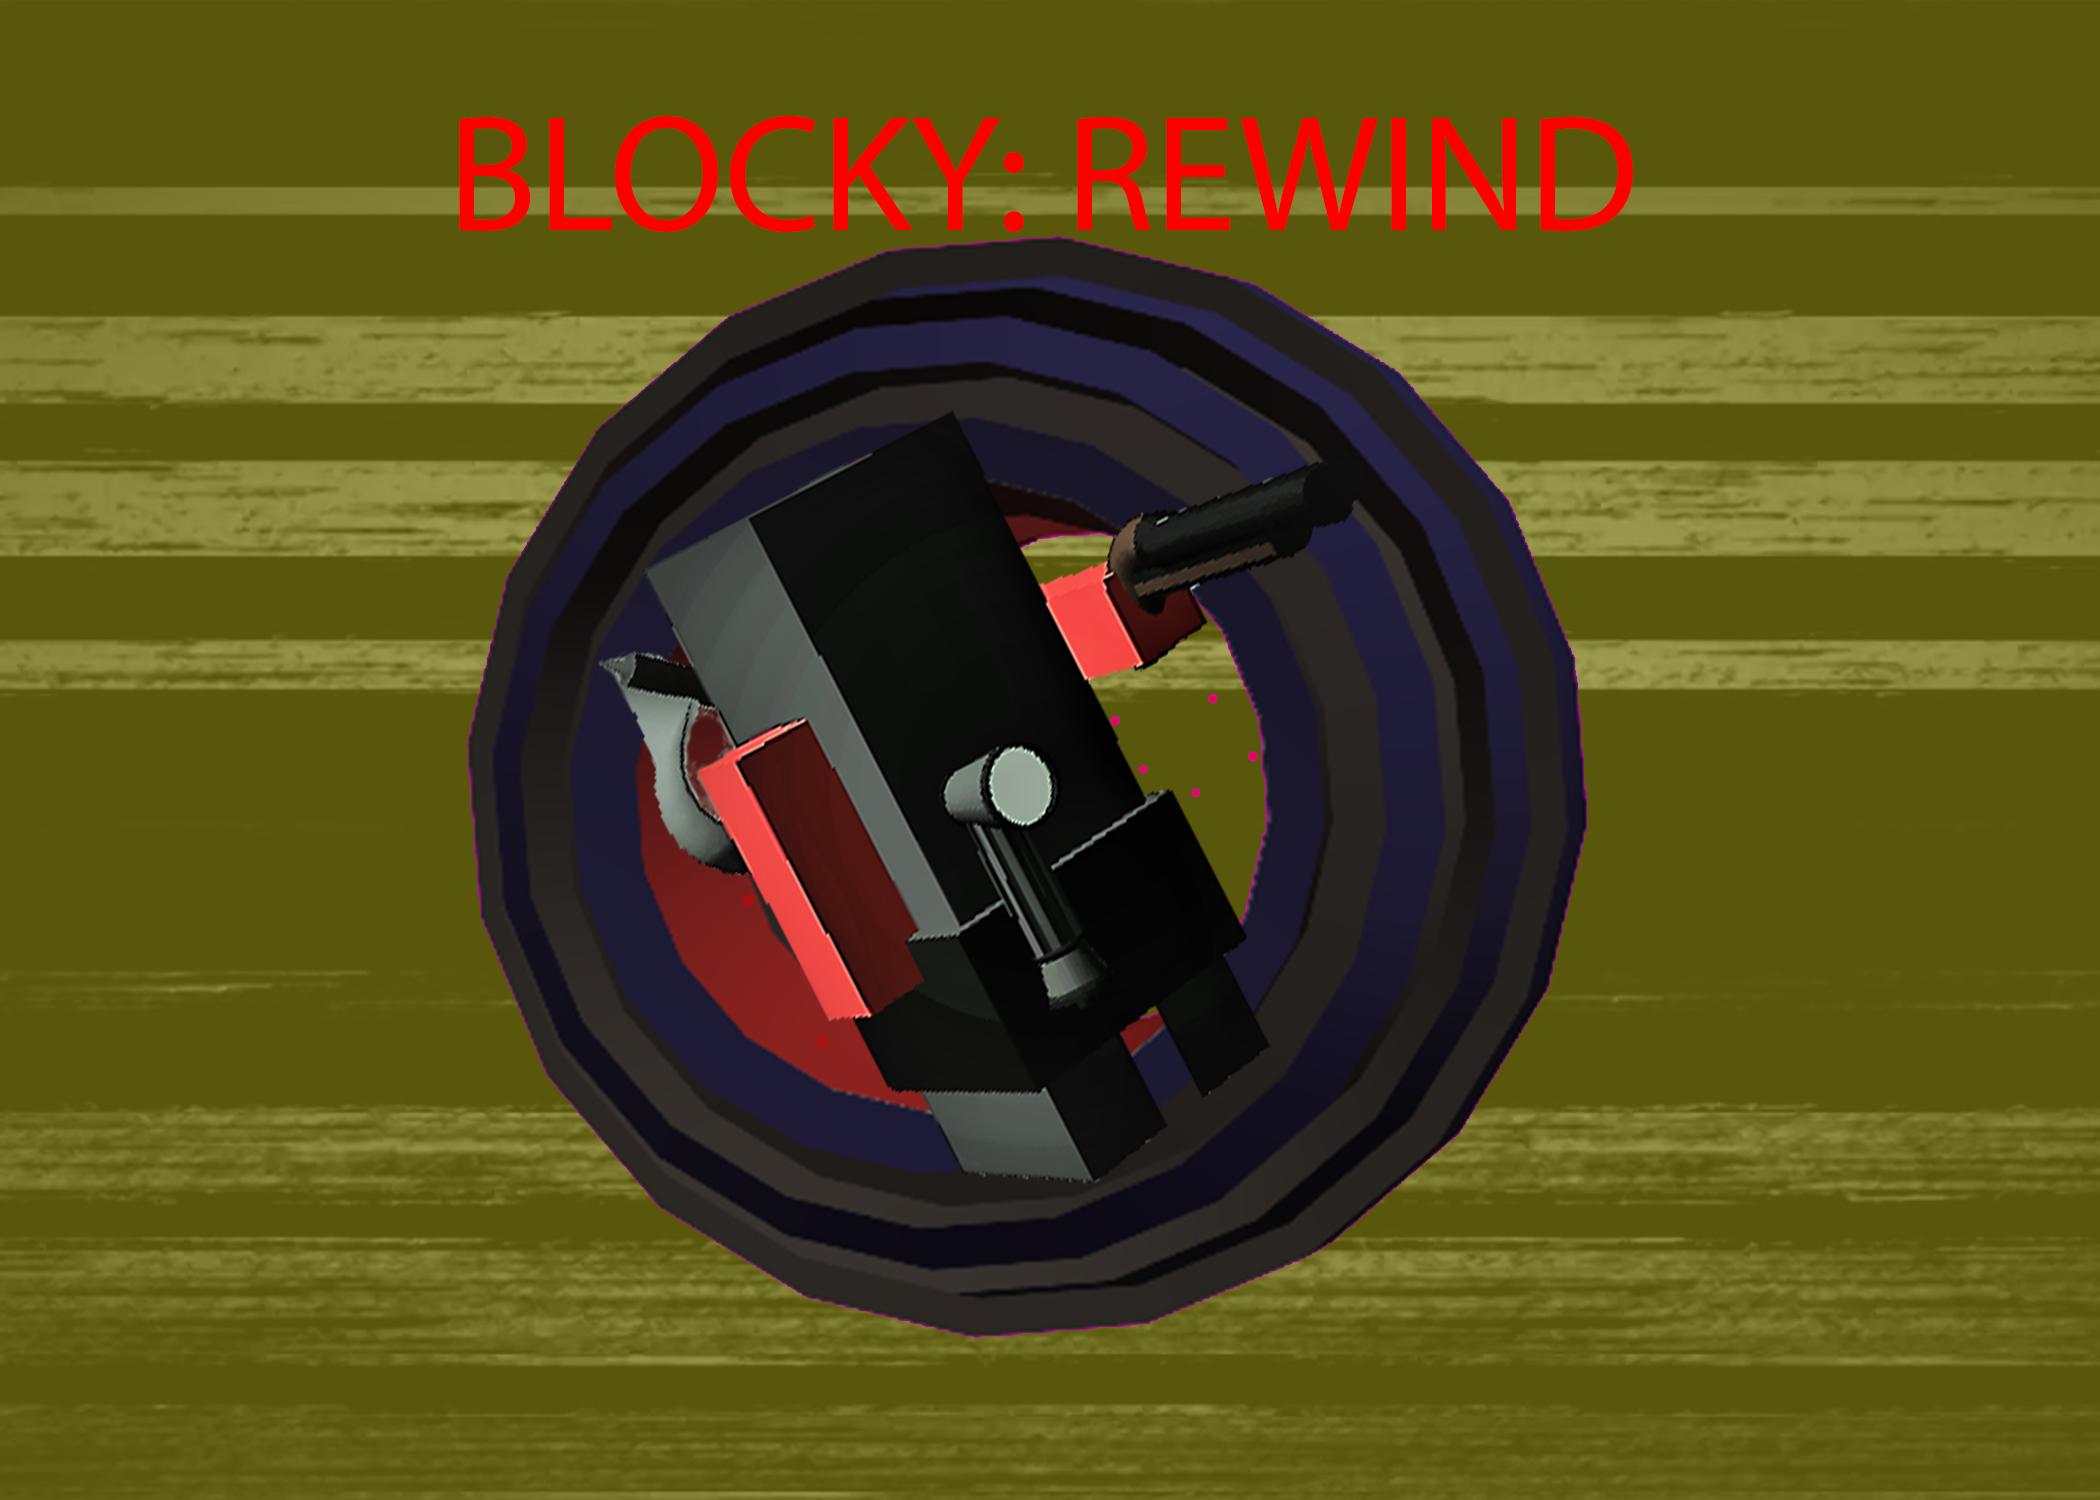 Blocky: Rewind